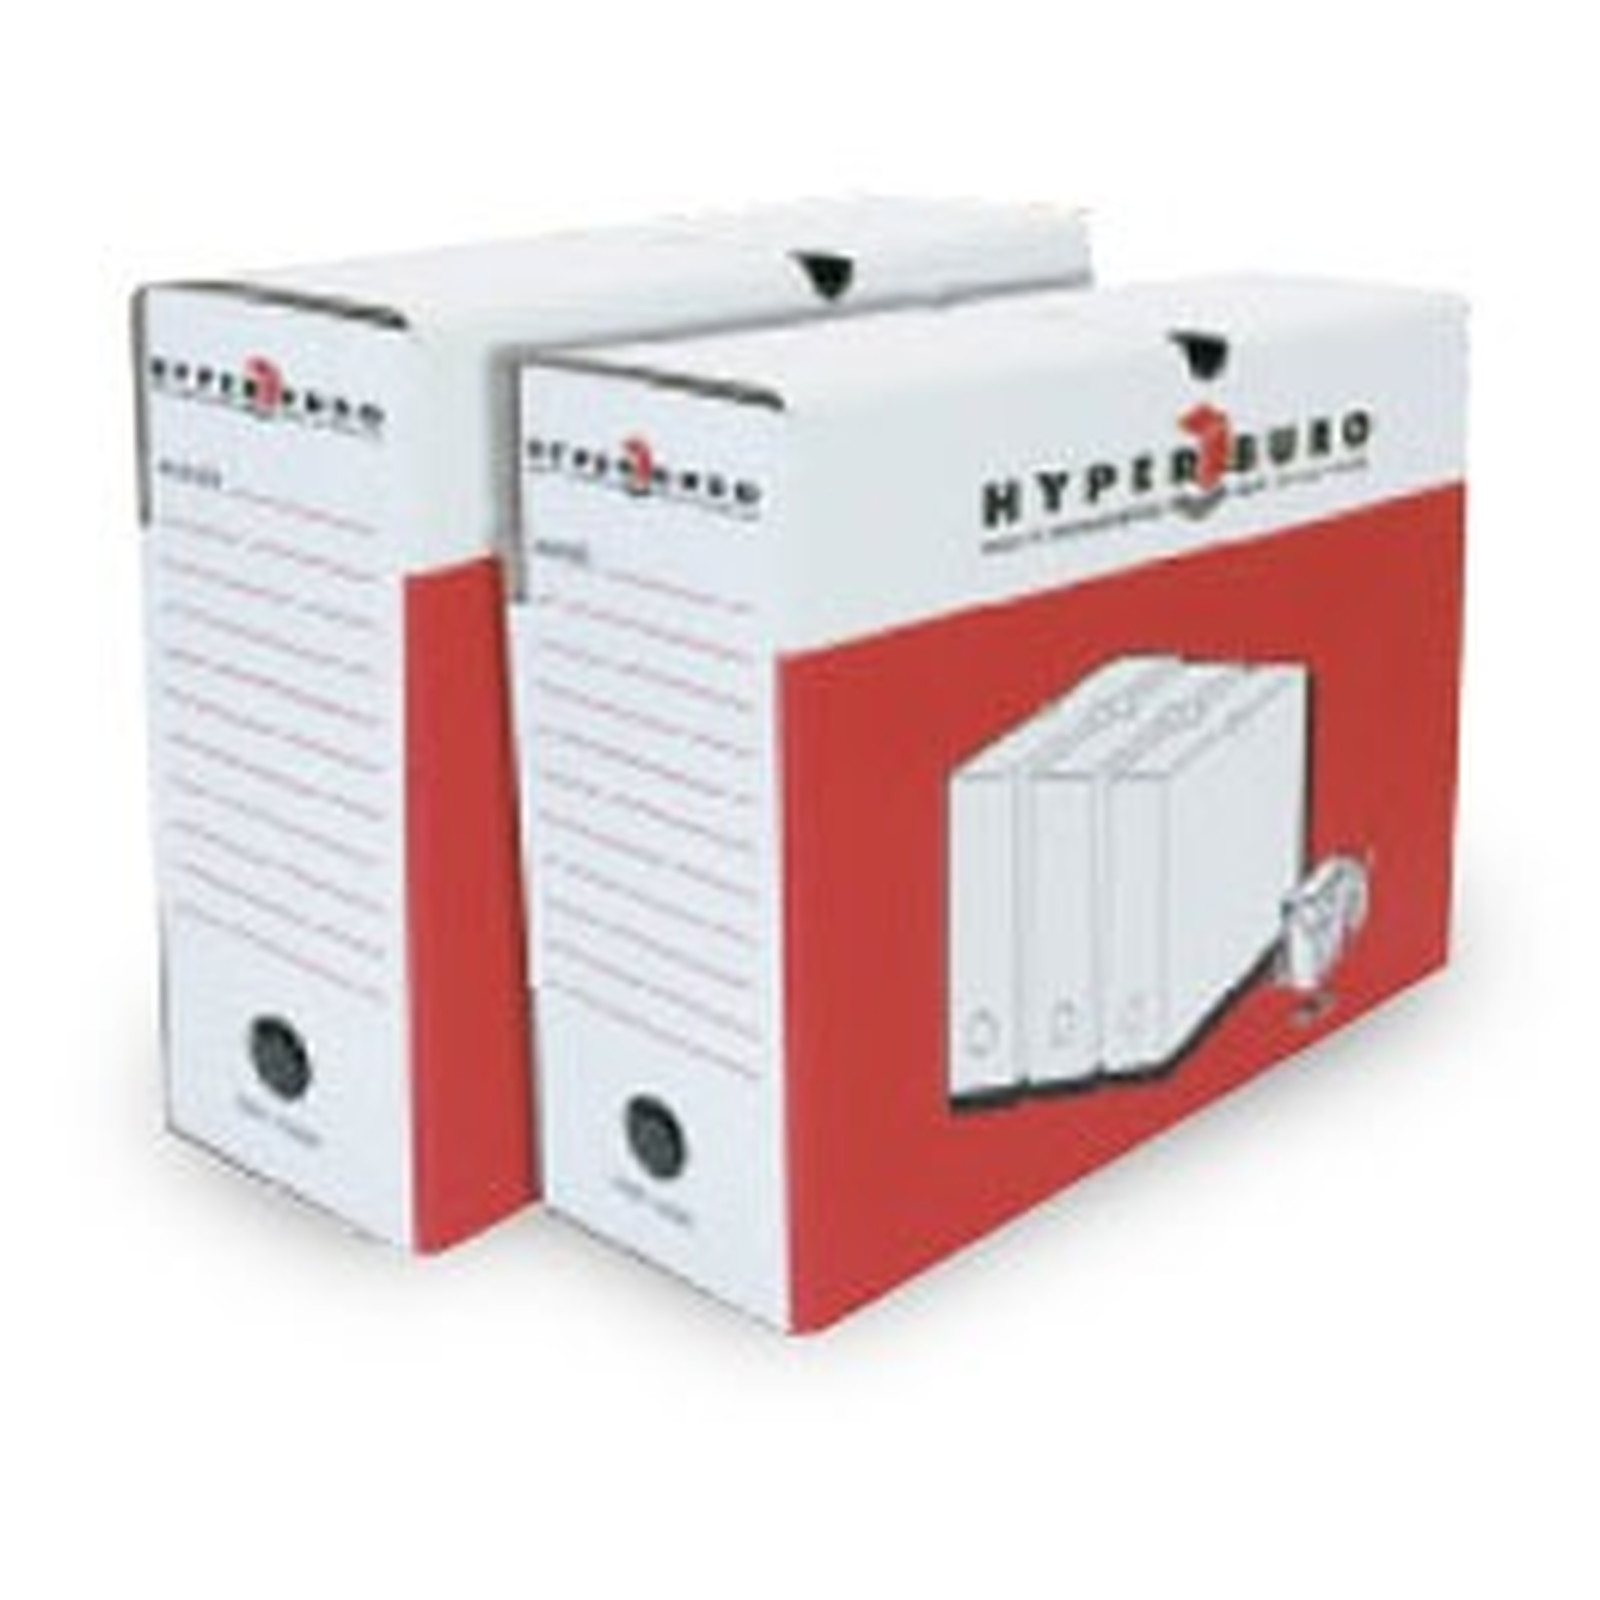 HYPERBURO 10 boîtes à archives dos 20 cm